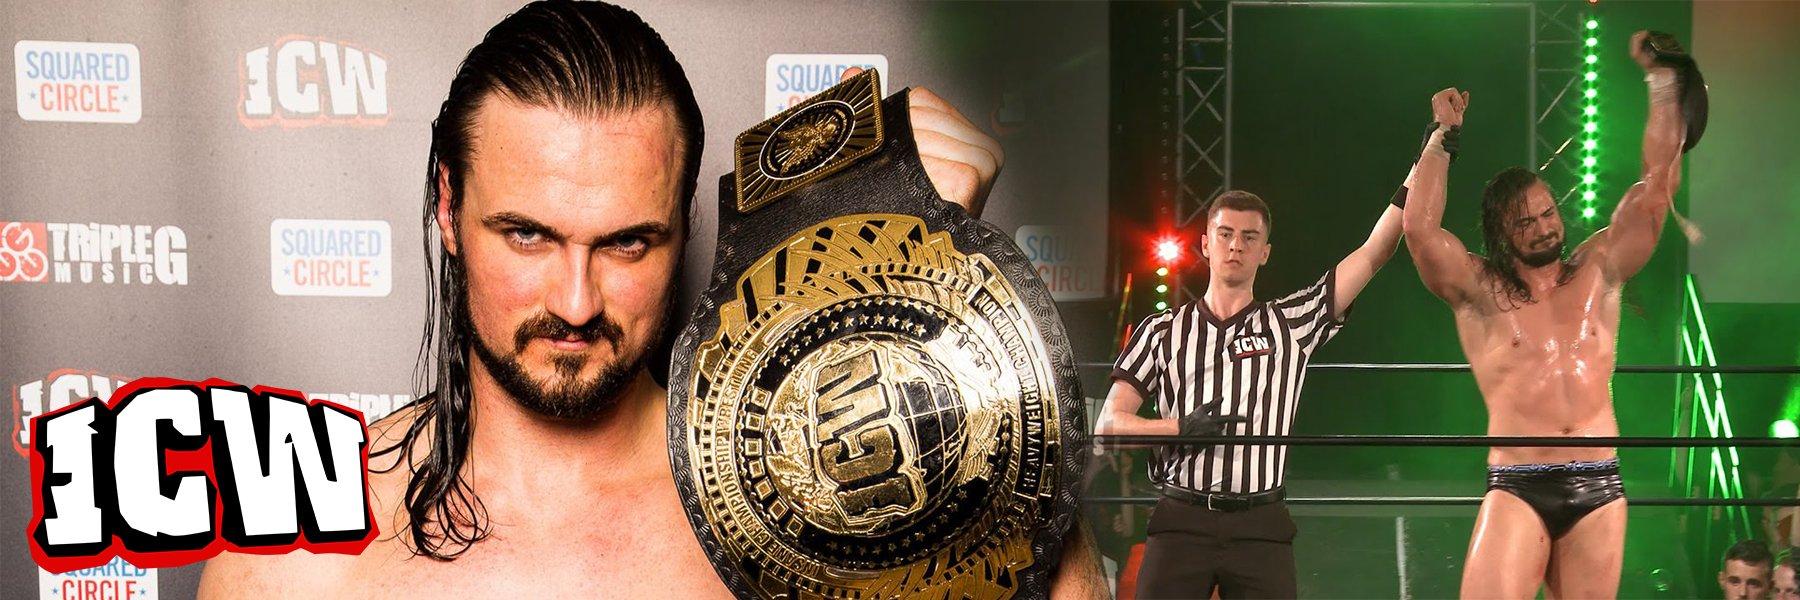 ICW FEATURING WWE CHAMPION DREW MCINTYRE